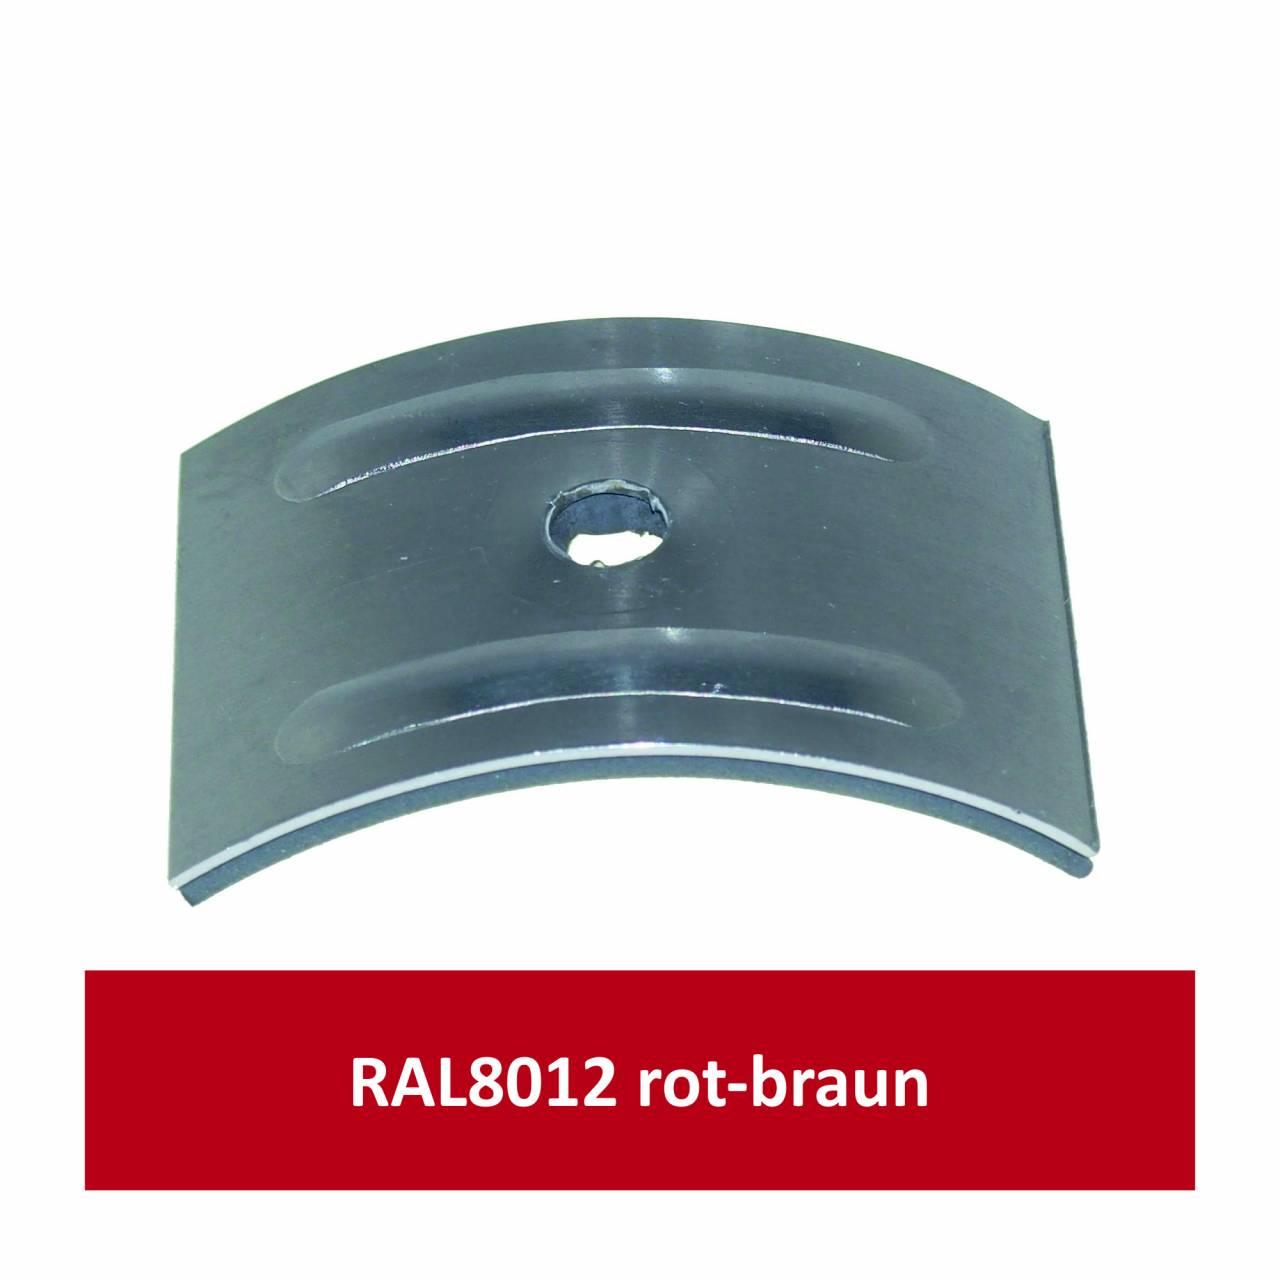 Kalotten für Welle 177/51, Alu RAL8012 rotbraun/ Pck a 100 Stück